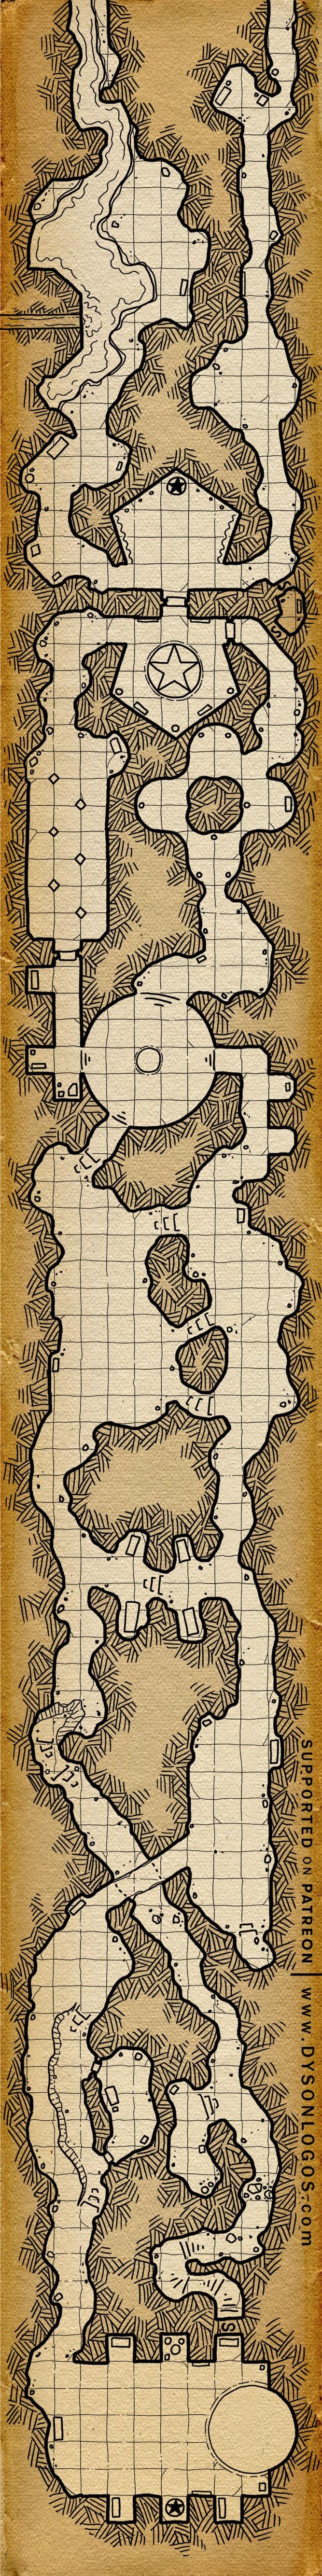 Long Dungeon is Long (300 dpi)